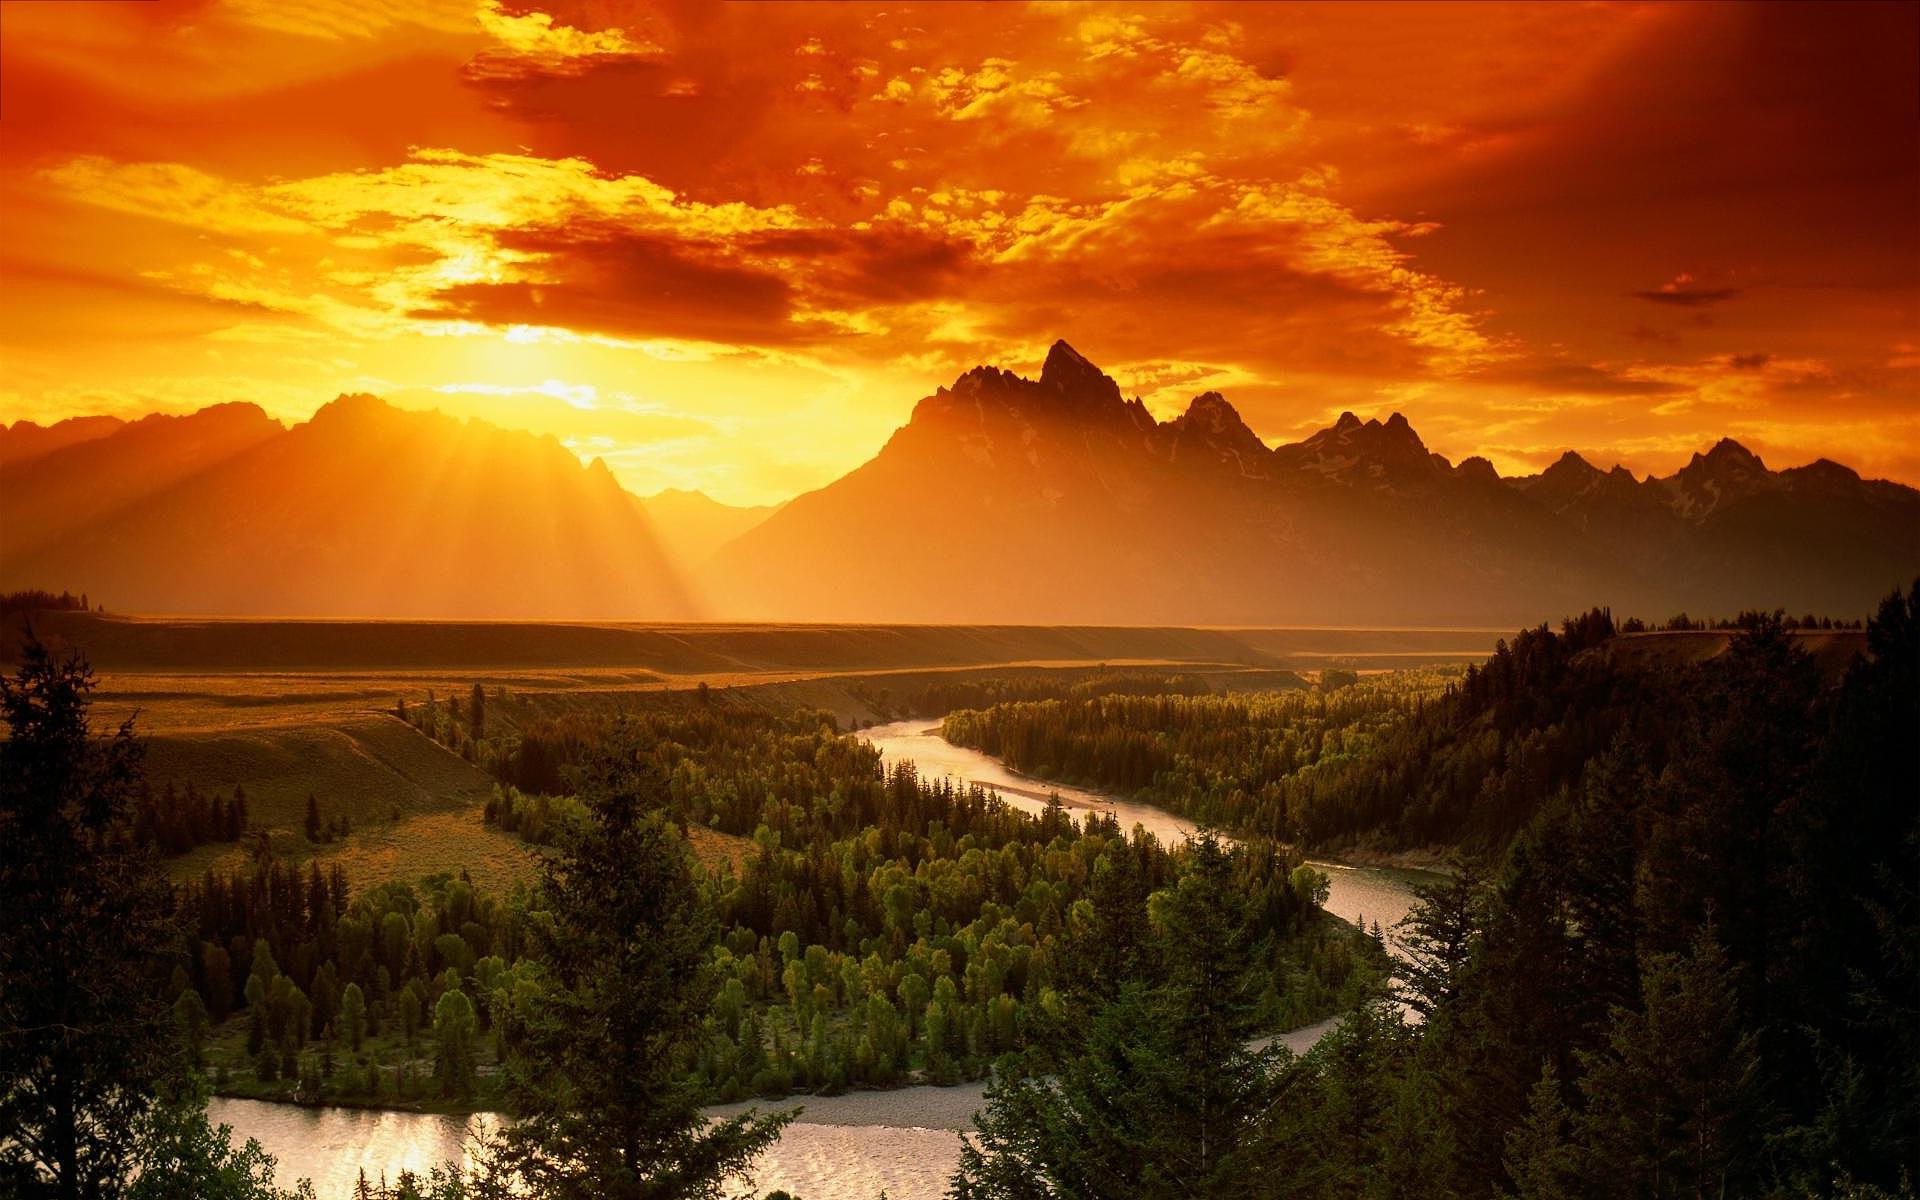 Live Fall Wallpaper For Pc Sunset Wallpapers Landscape Hd Desktop Wallpapers 4k Hd